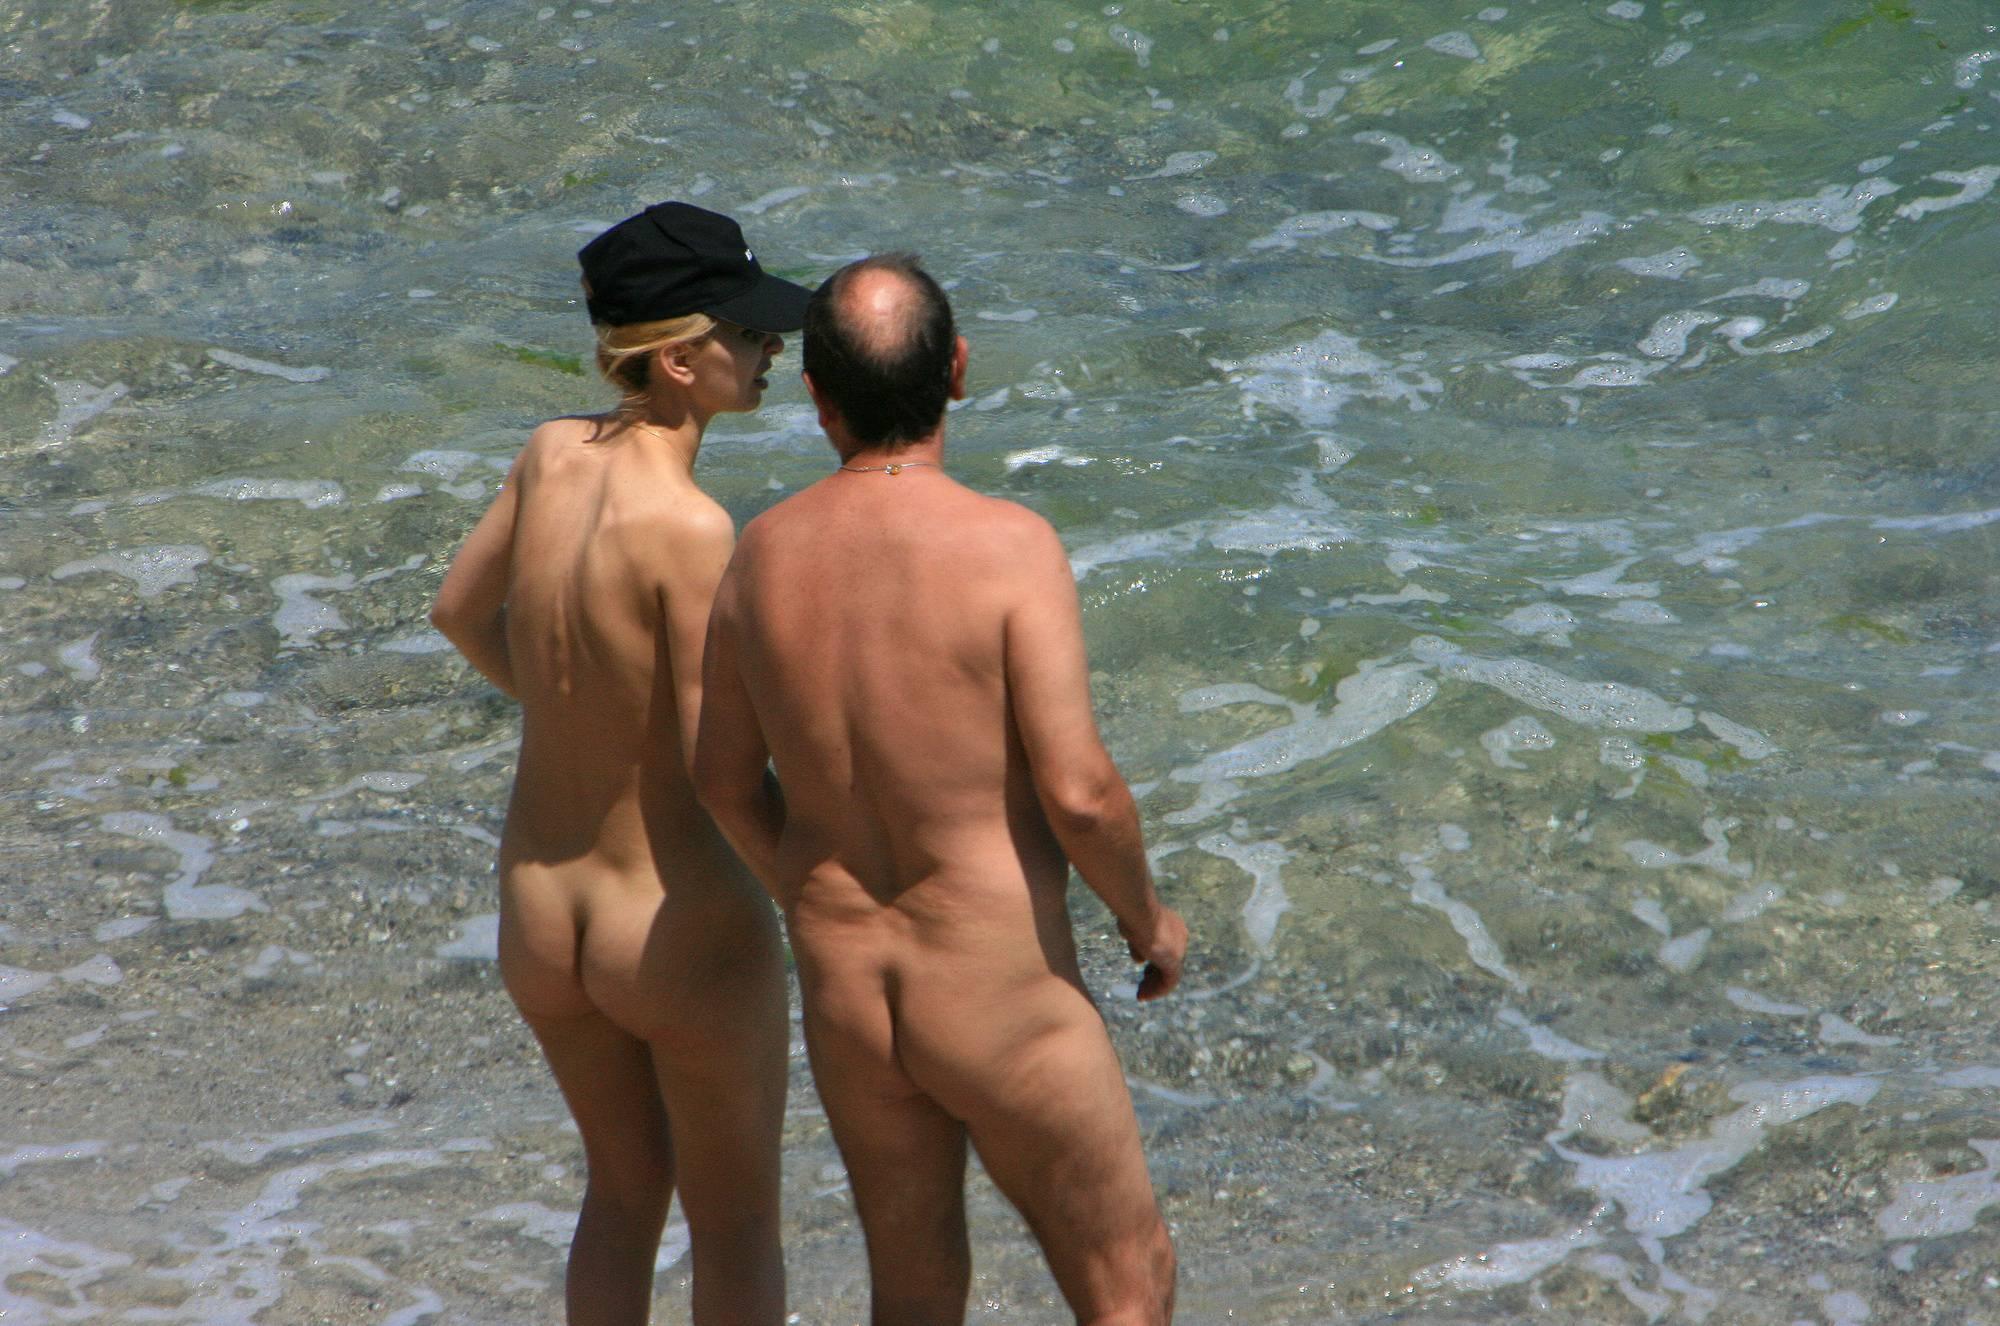 Nudist Photos Bulgarian Group Friends - 1